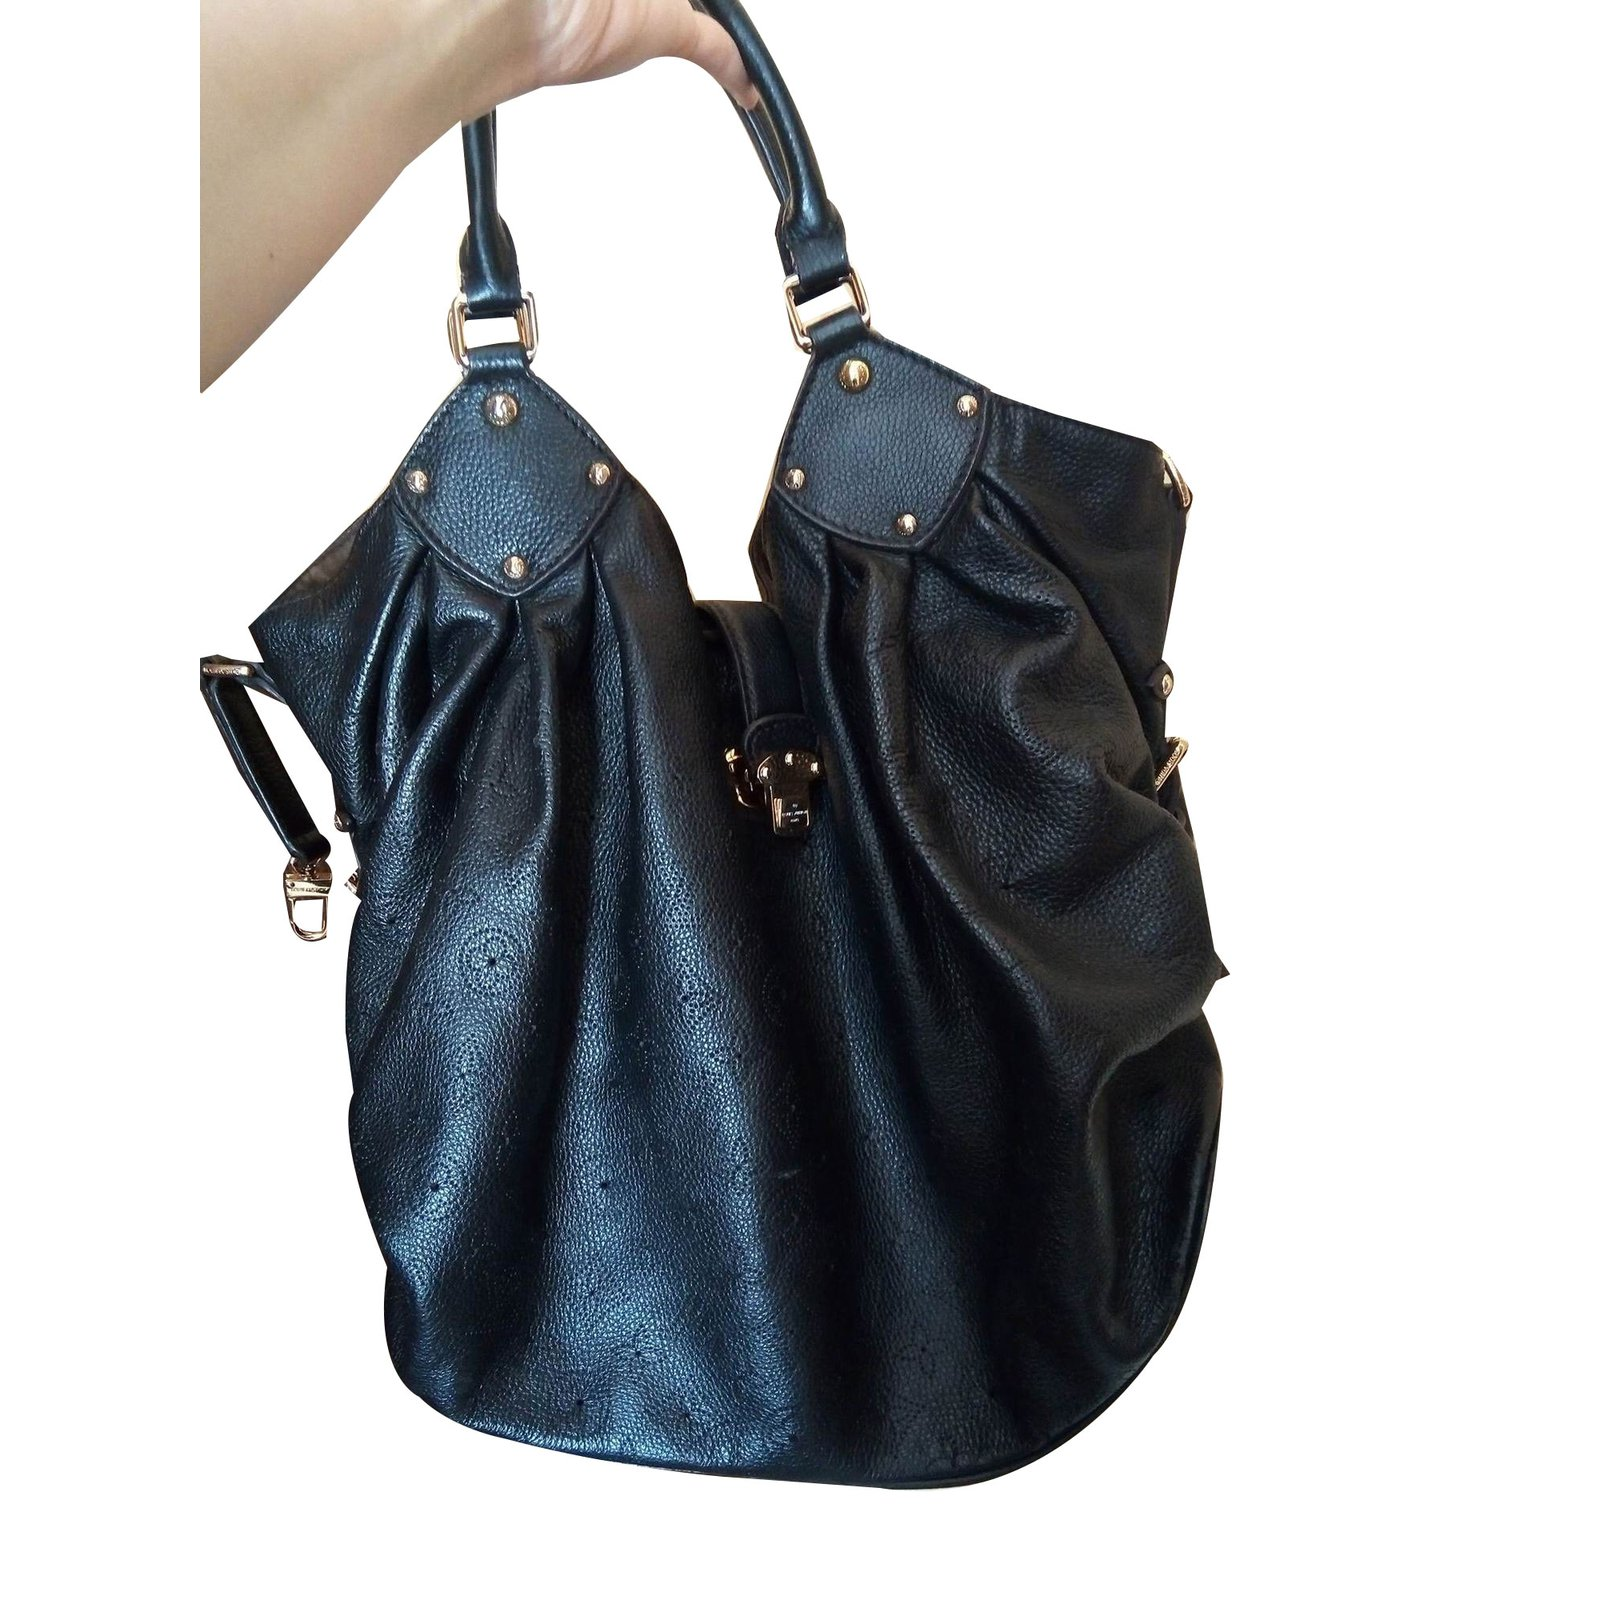 Louis Vuitton Mahina Handbags Leather Black Ref 75183